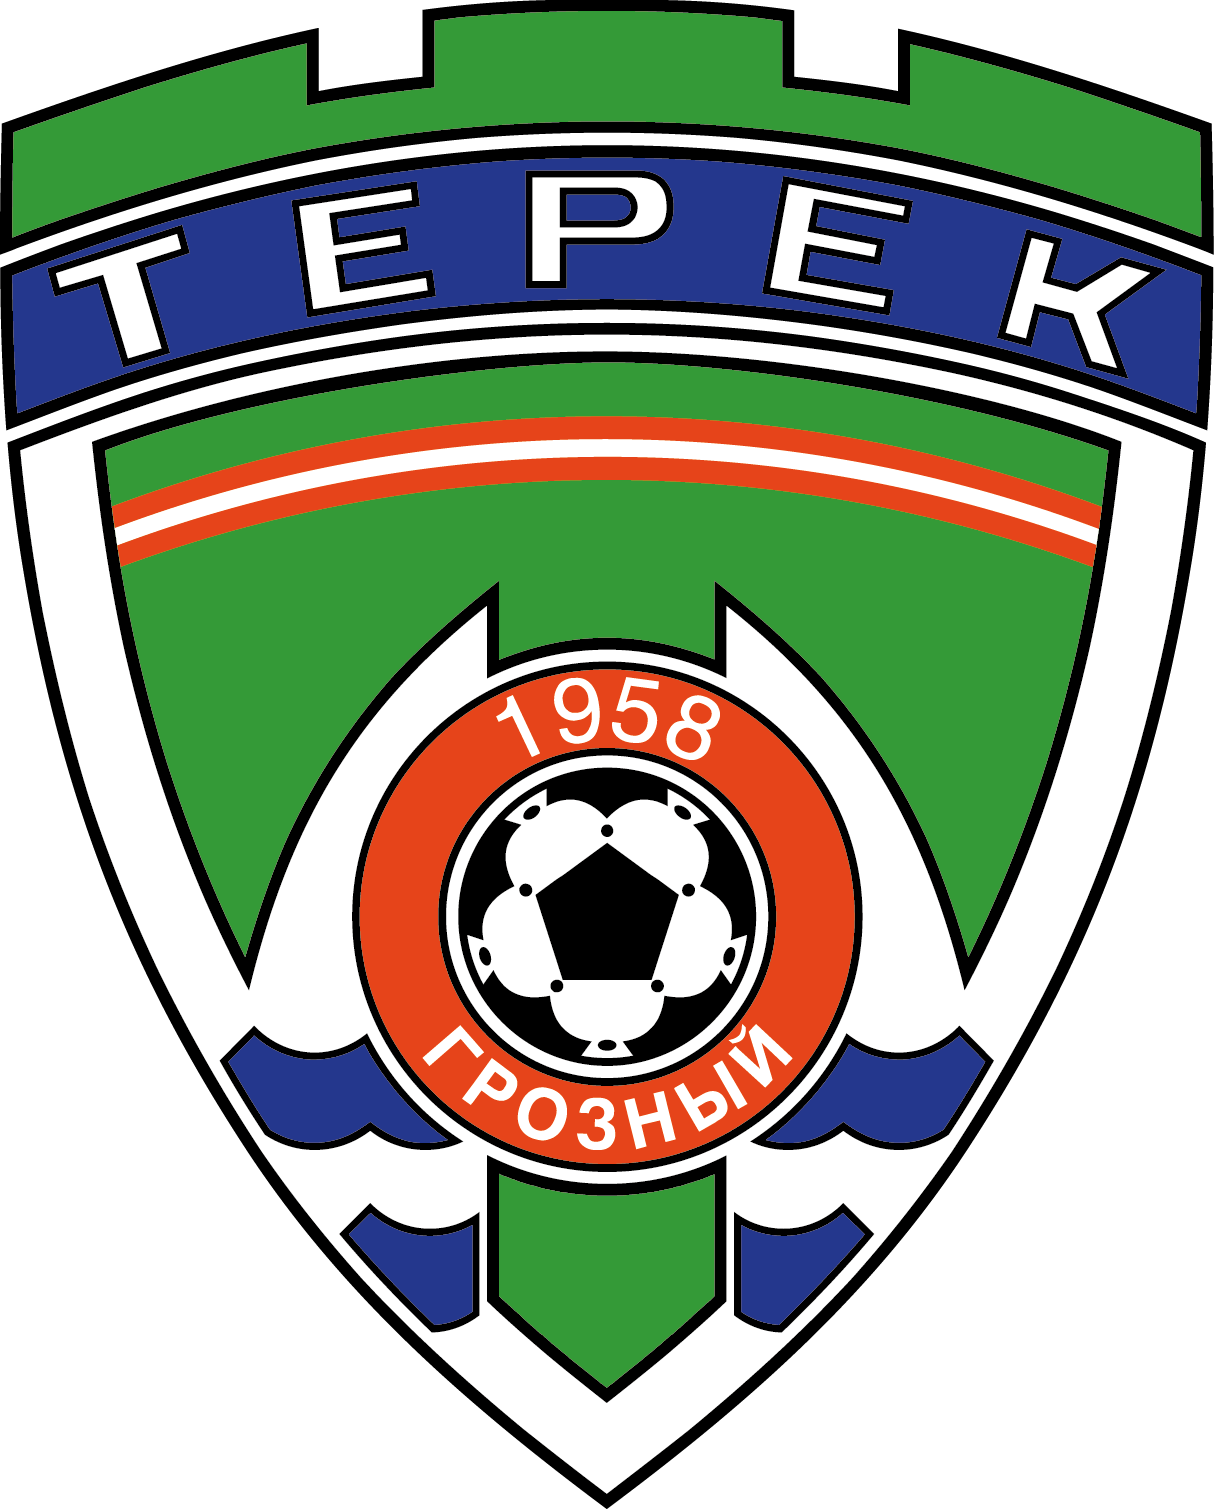 Terek Grozny herb 2004